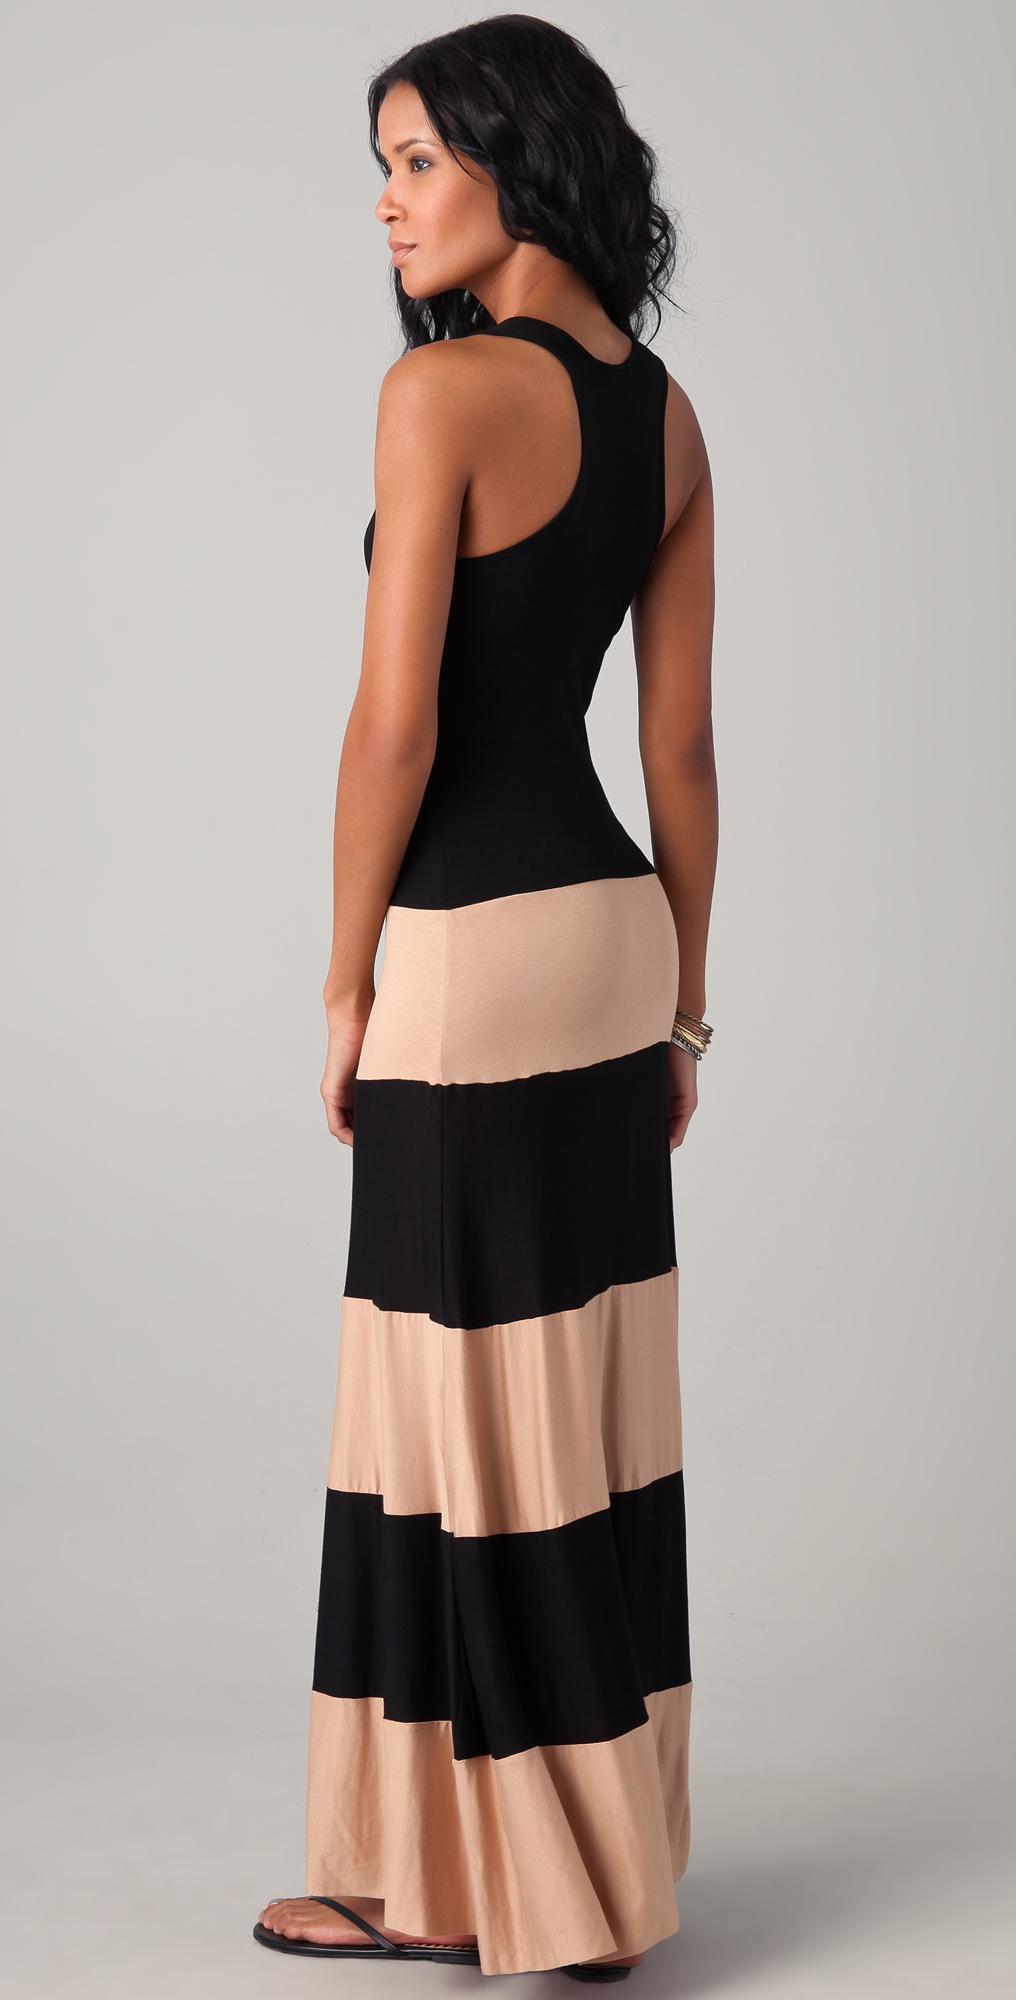 Karina Grimaldi Biscot Long Tank Dress | SHOPBOP